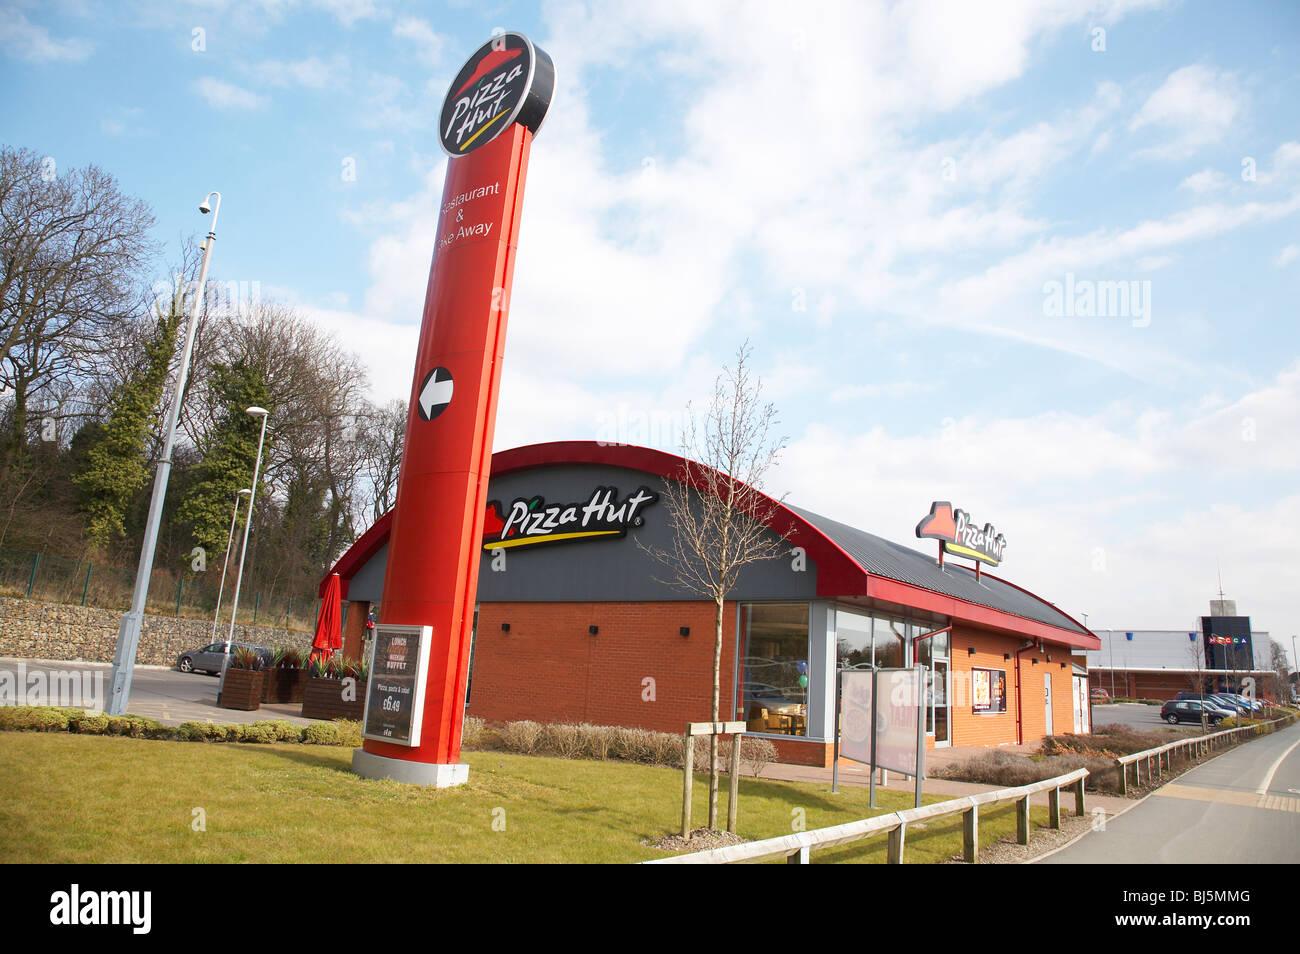 Pizza Hut Restaurant In Crewe Uk Stock Photo 28400192 Alamy